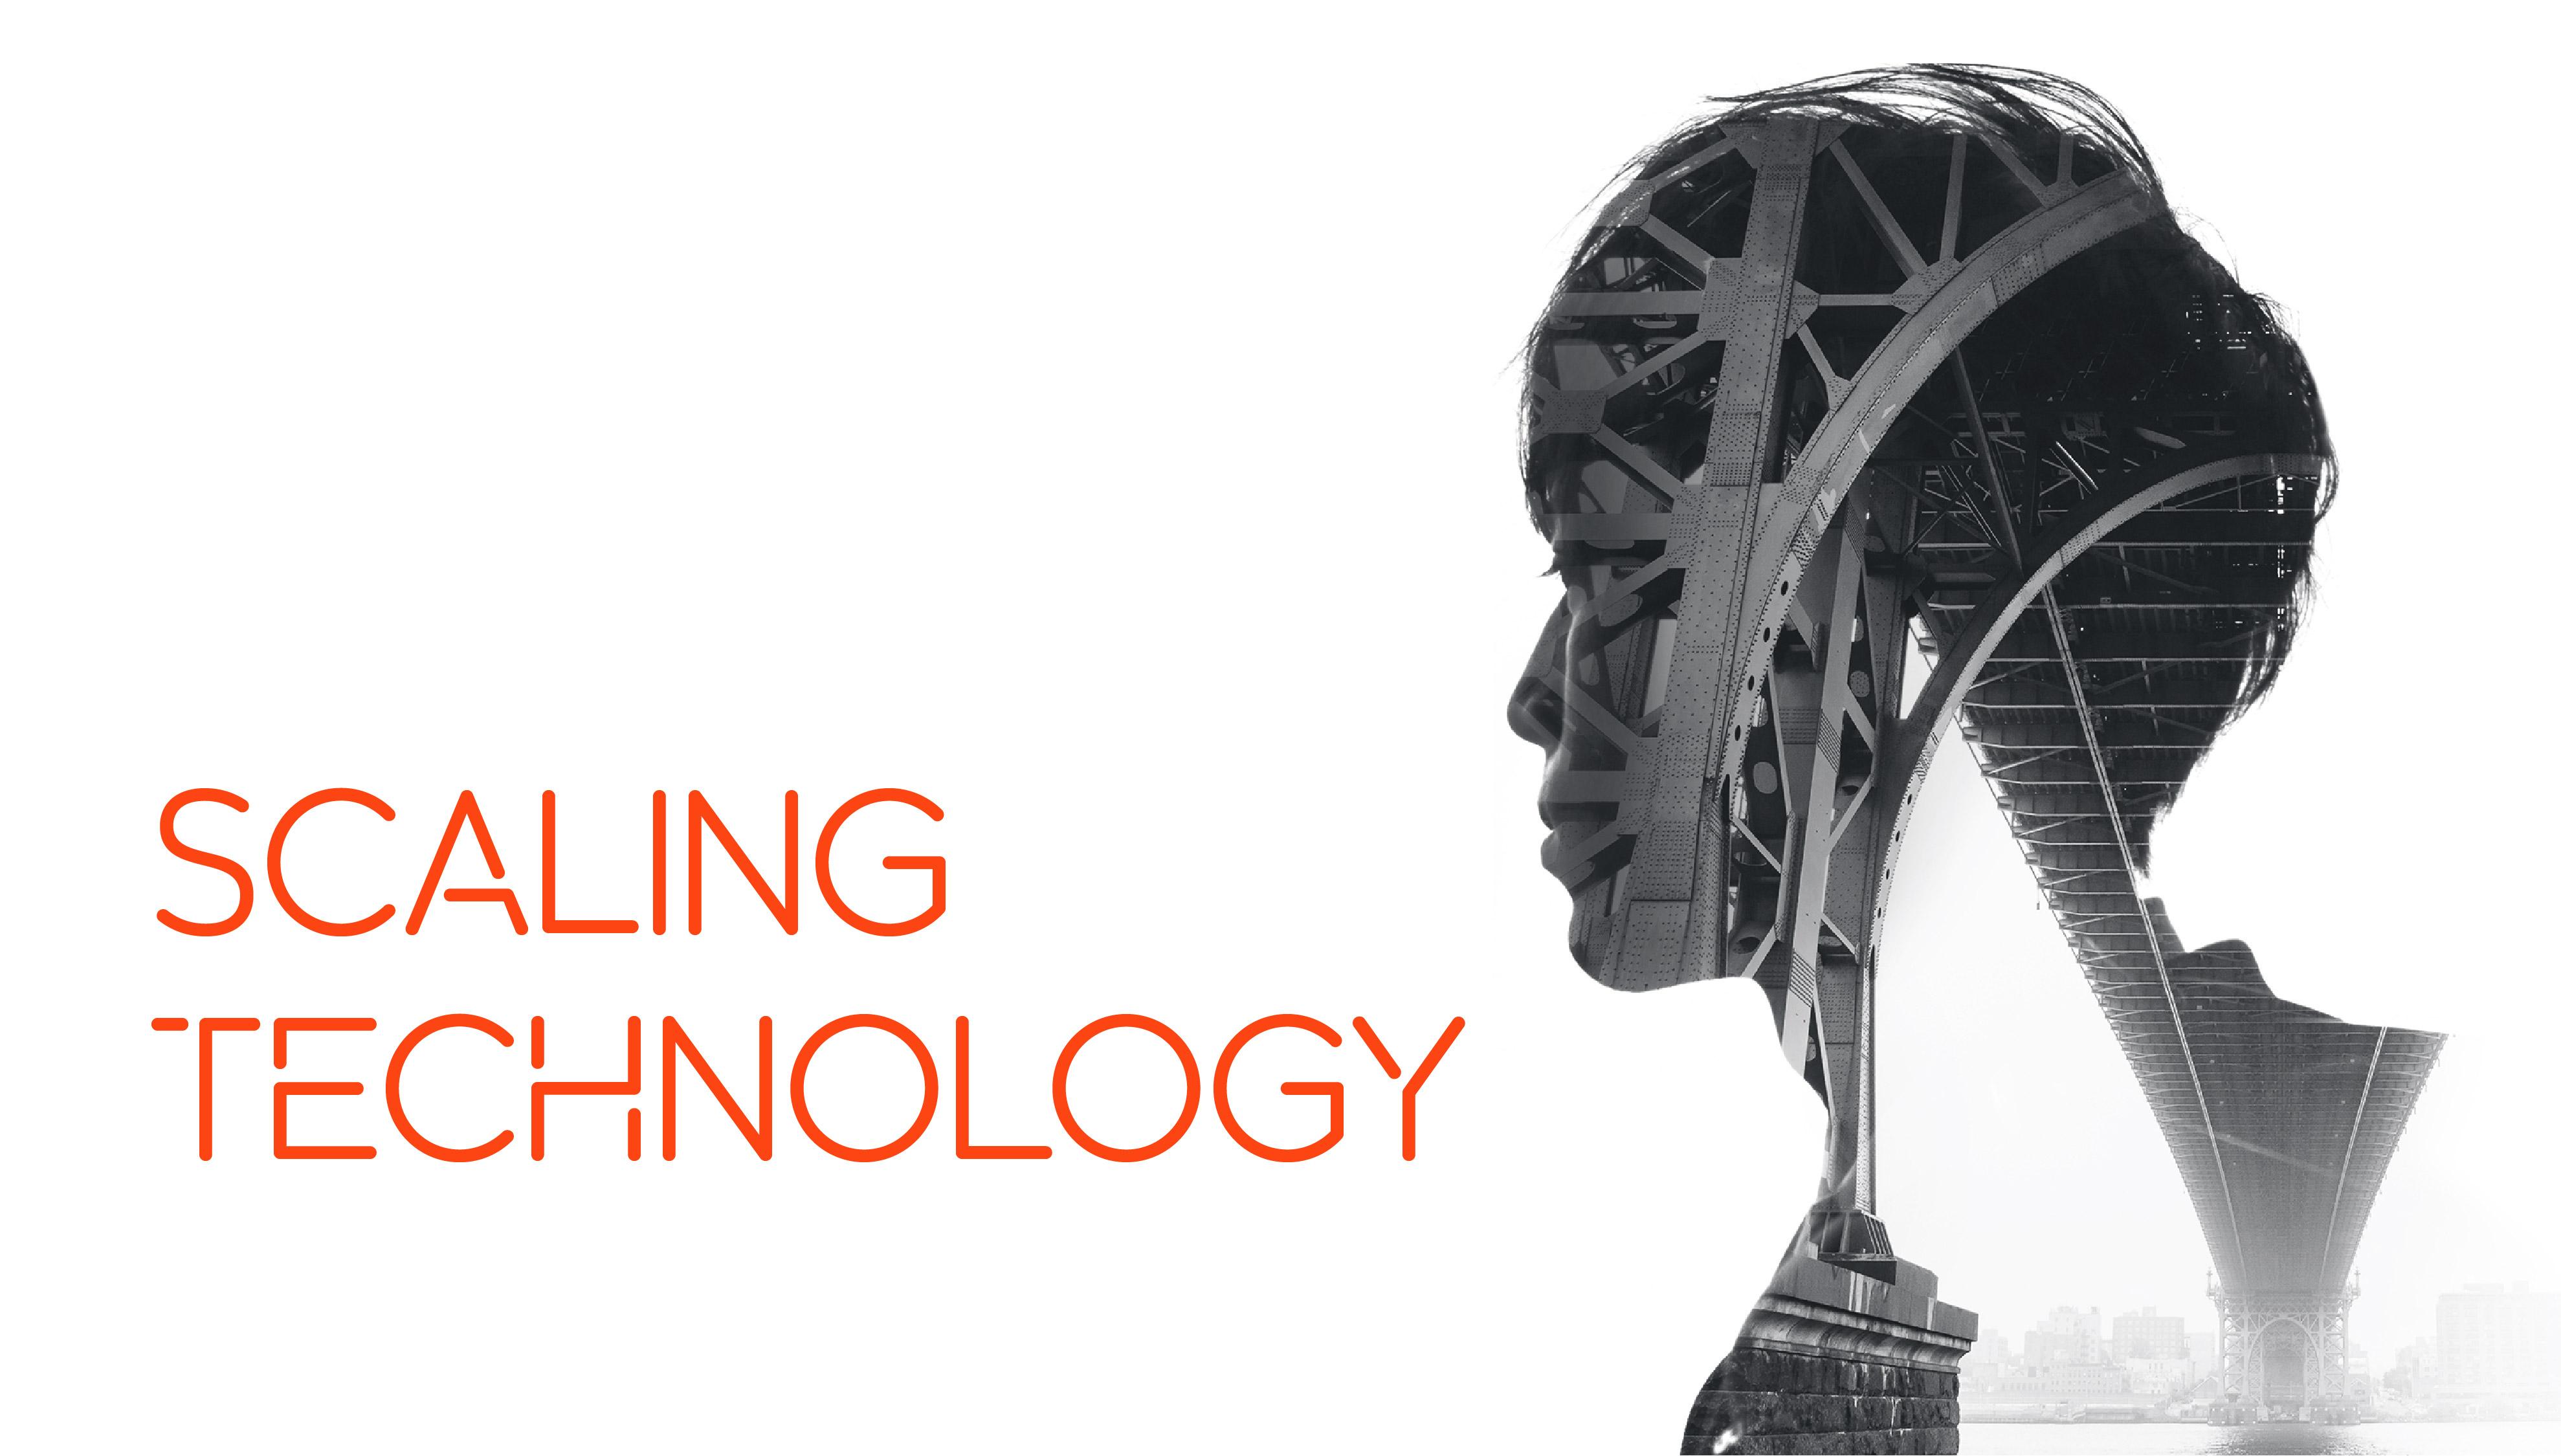 SCALING TECHNOLOGY